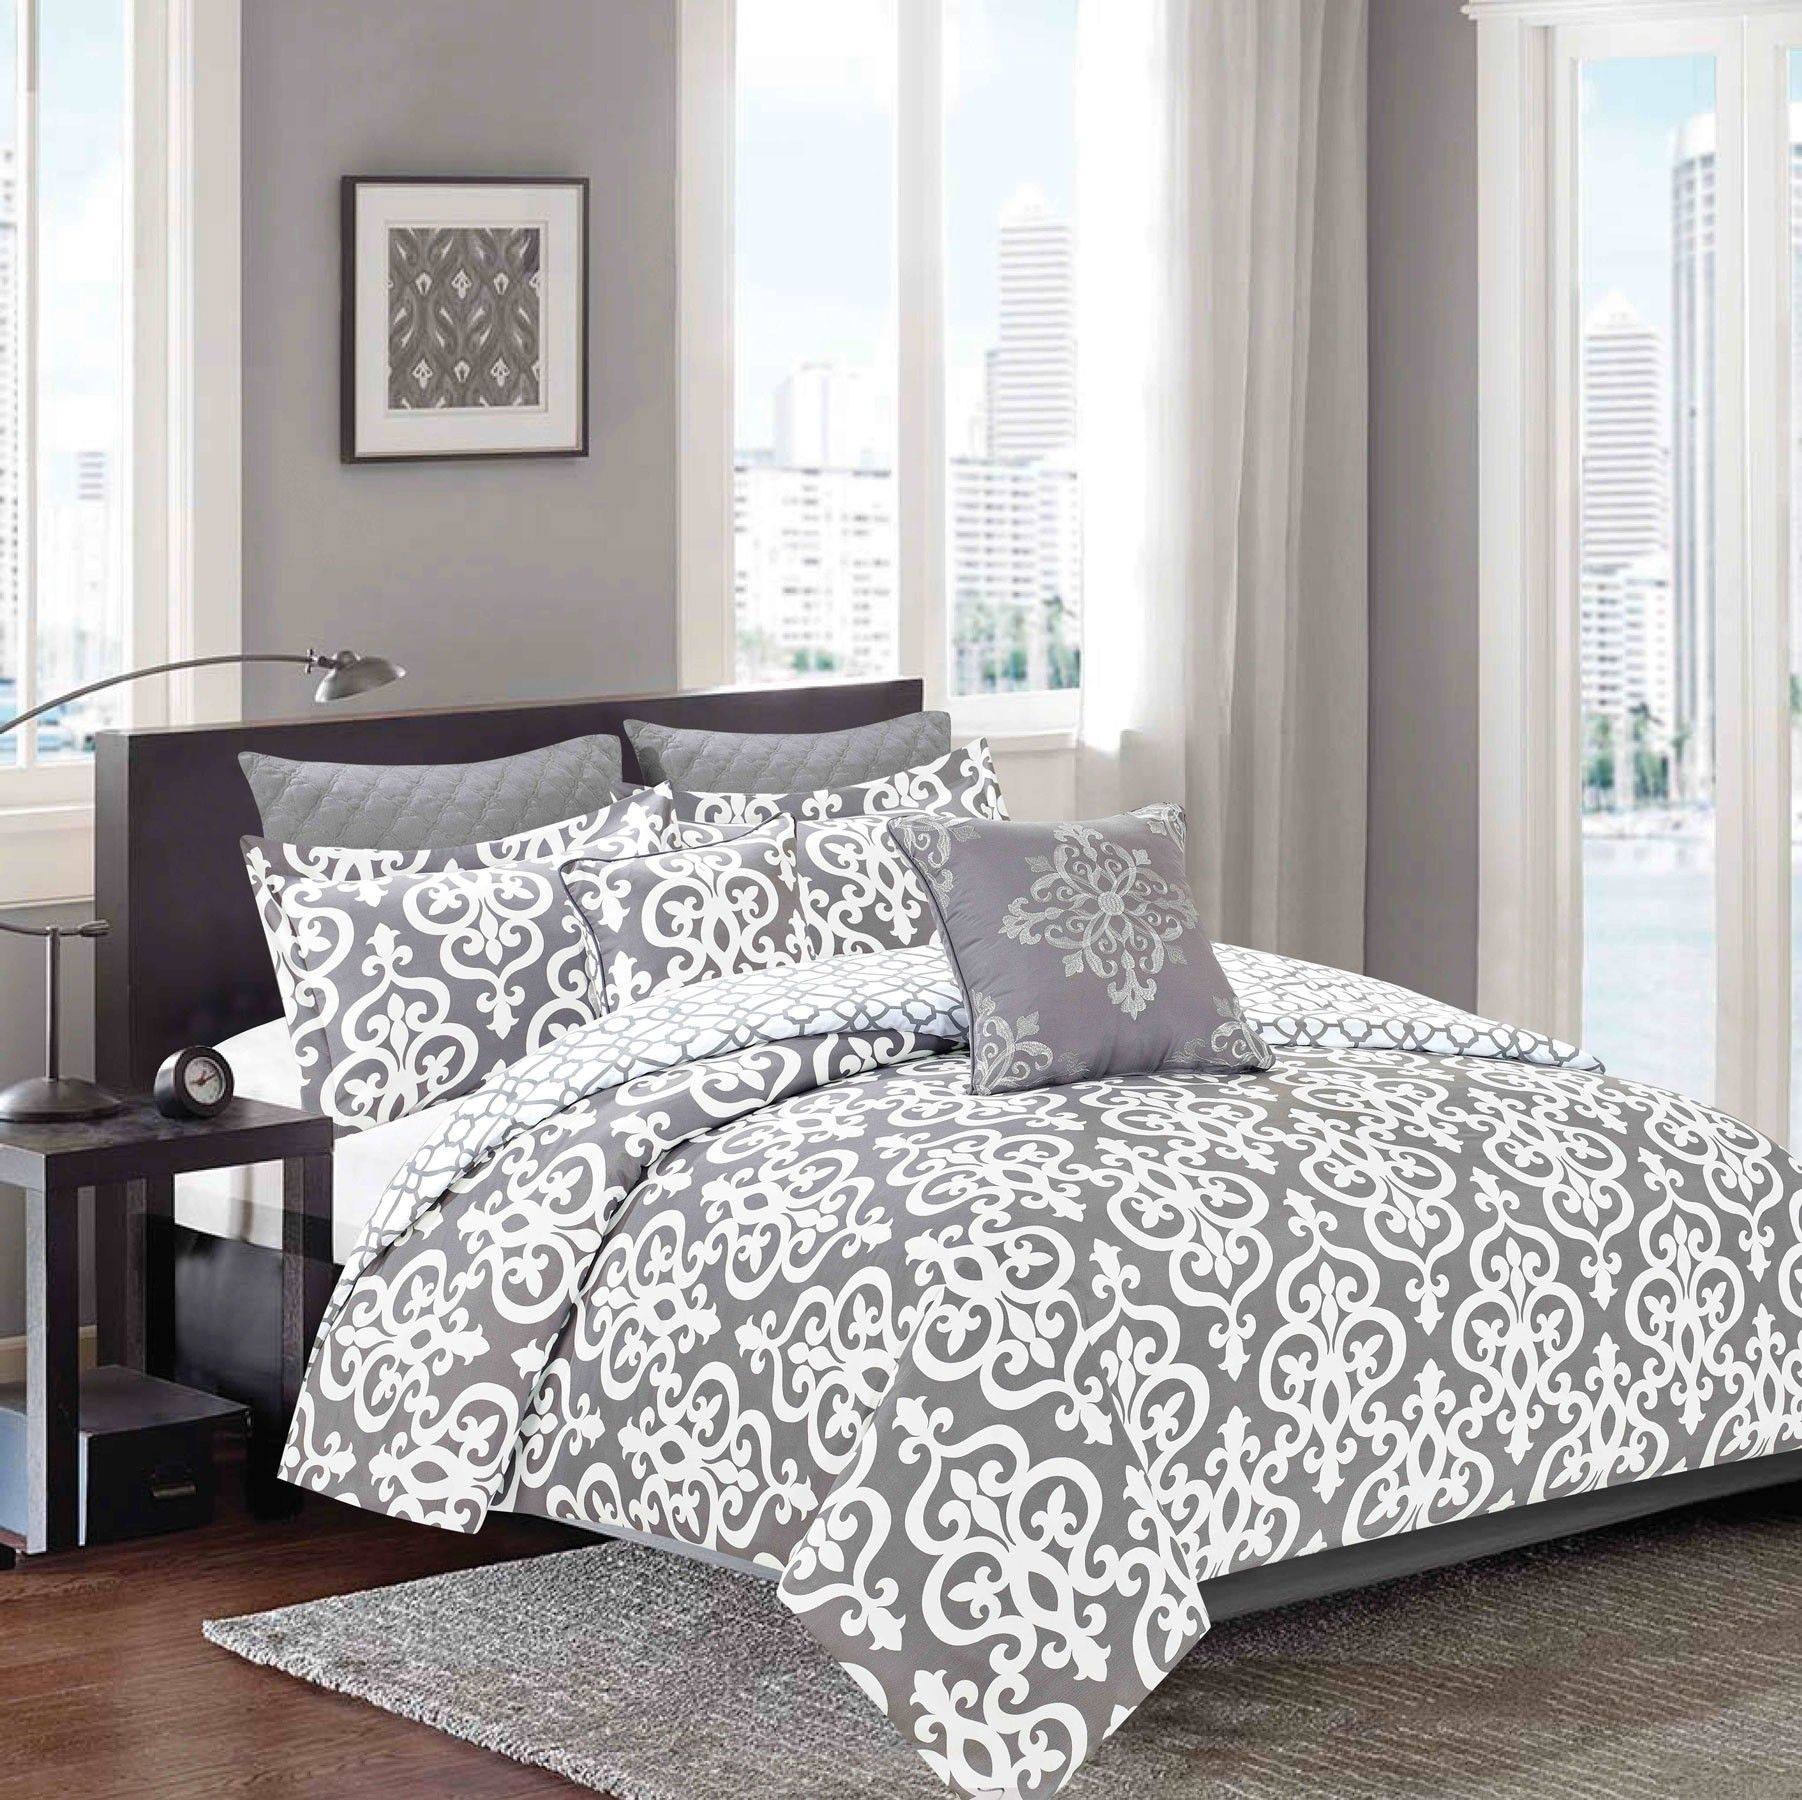 Charming Crest Home Pottia Bedding Comforter 7 Piece Queen Size Bed Set, Grey And  White Medallion Damask Design